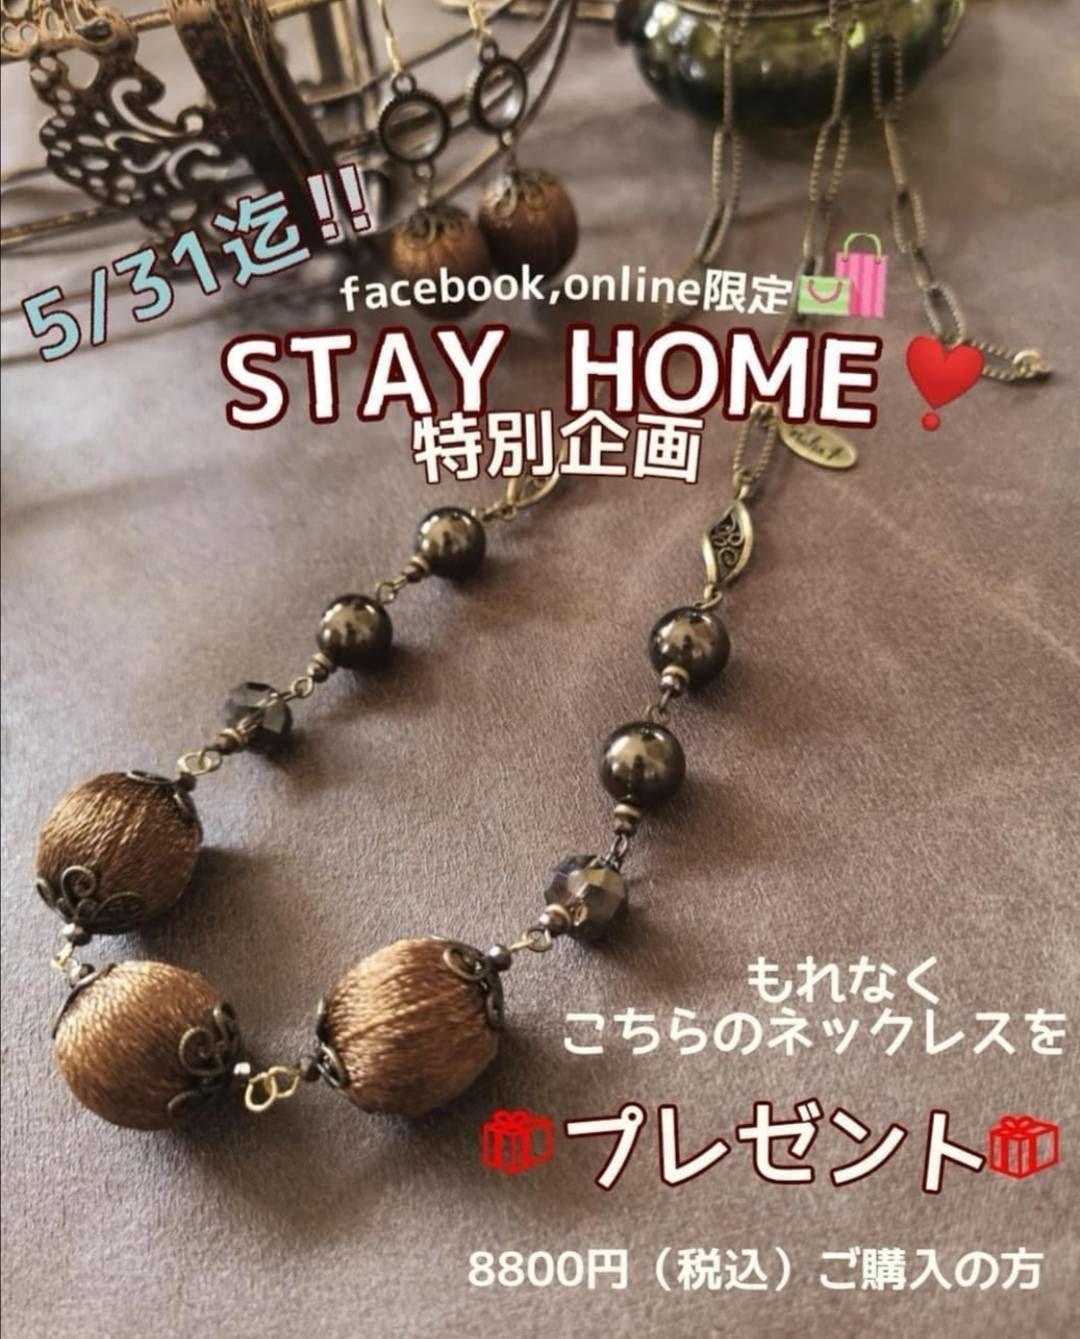 STAY HOME特別企画